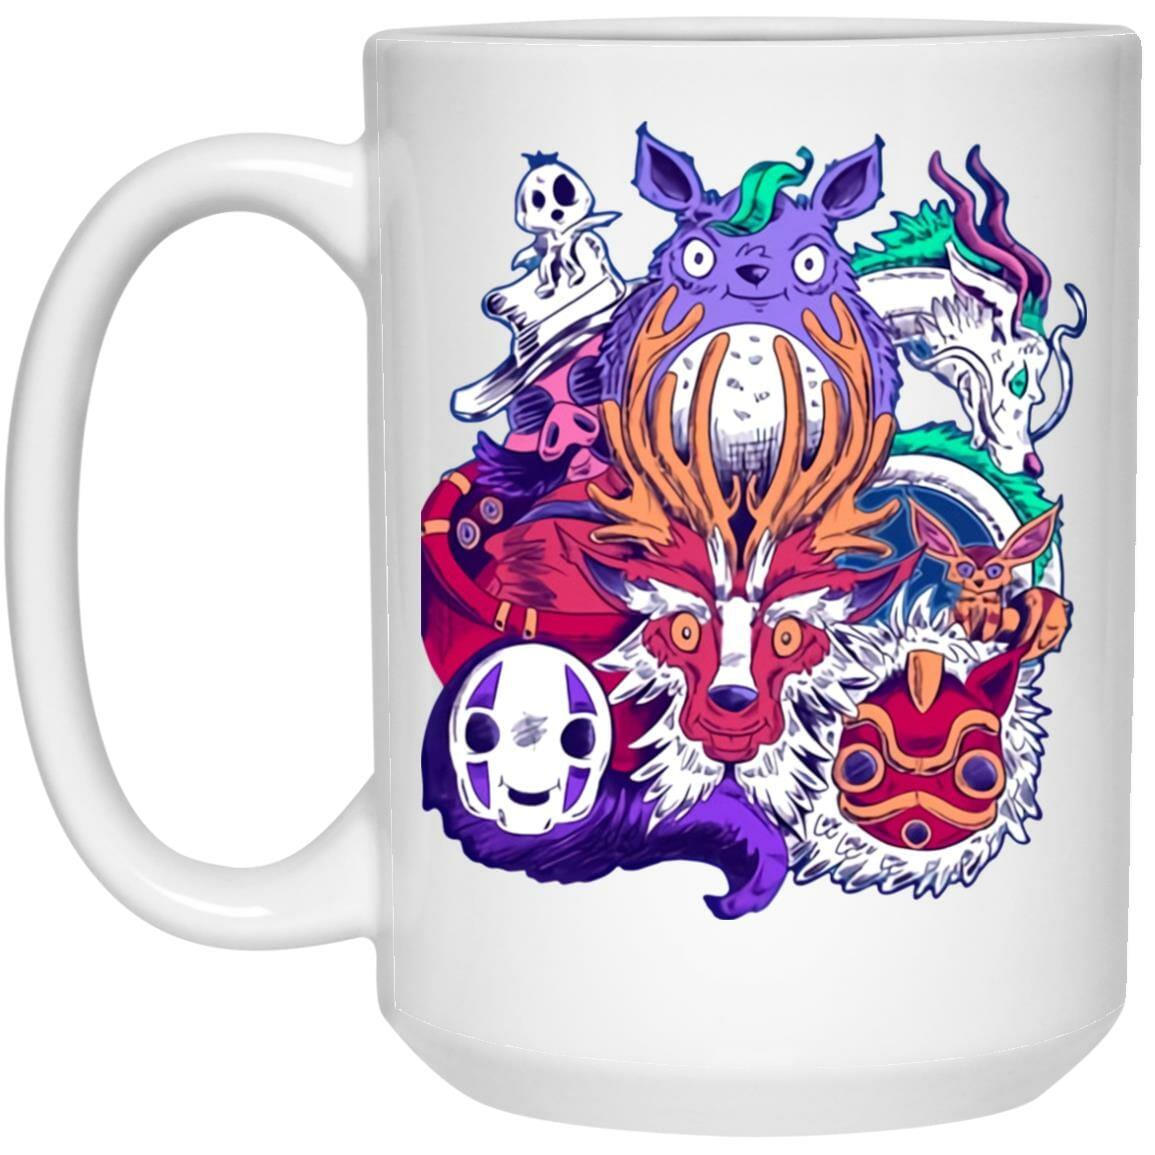 Ghibli Characters creepy style Mug